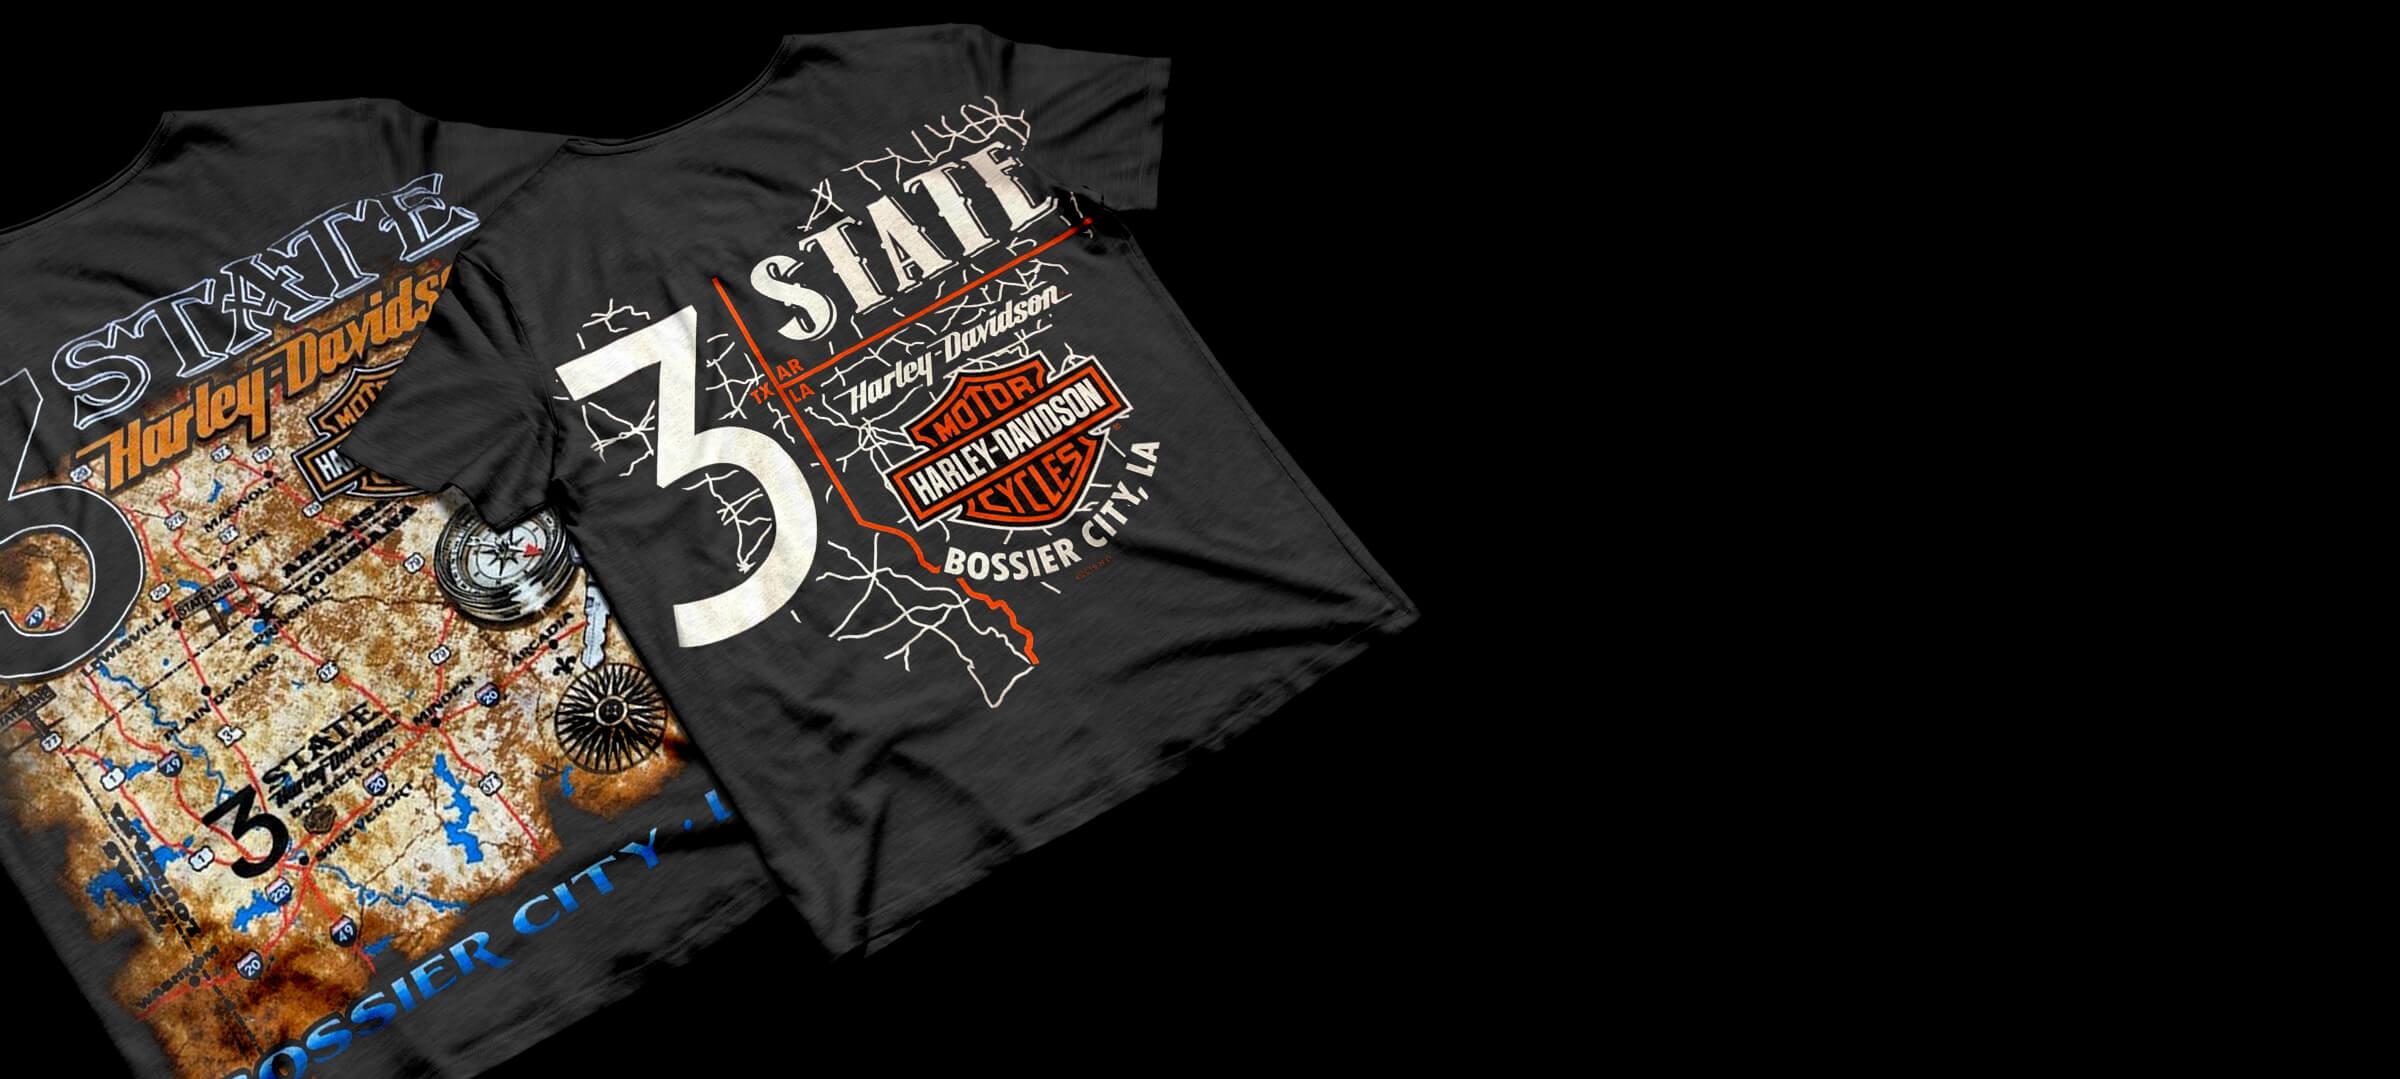 Buy a Harley Davidson® | Bossier City, LA | 3 State Harley